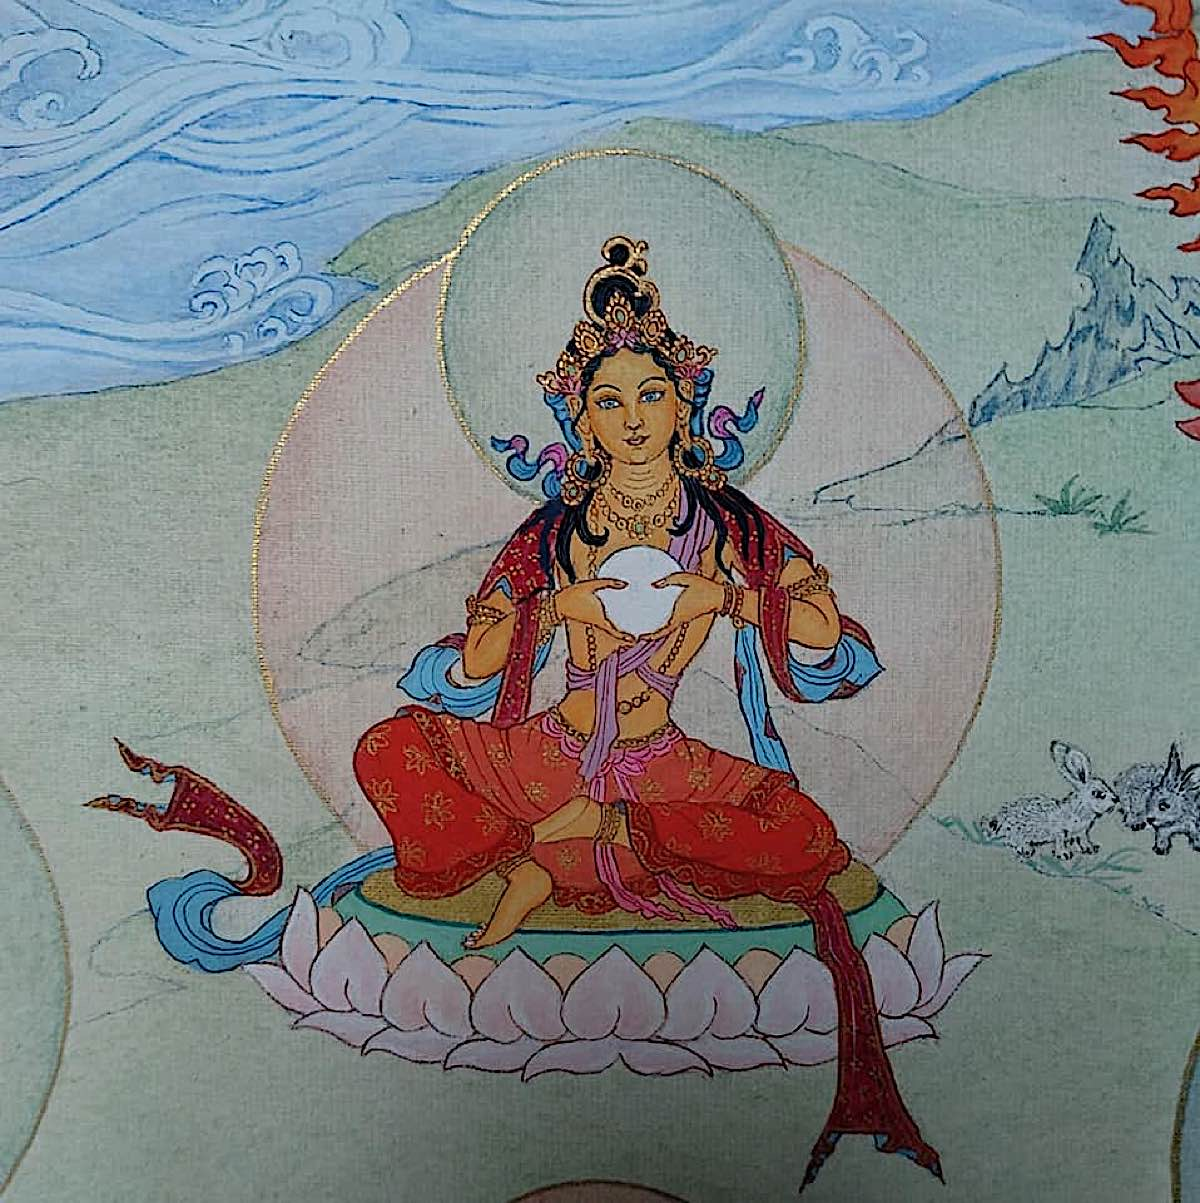 Buddha Weekly 17 Tara Accomplisher of All Bliss Sukha Sadhana Tara 21 Taras Thankha by Angeli Lhadripa Shkonda Buddhism